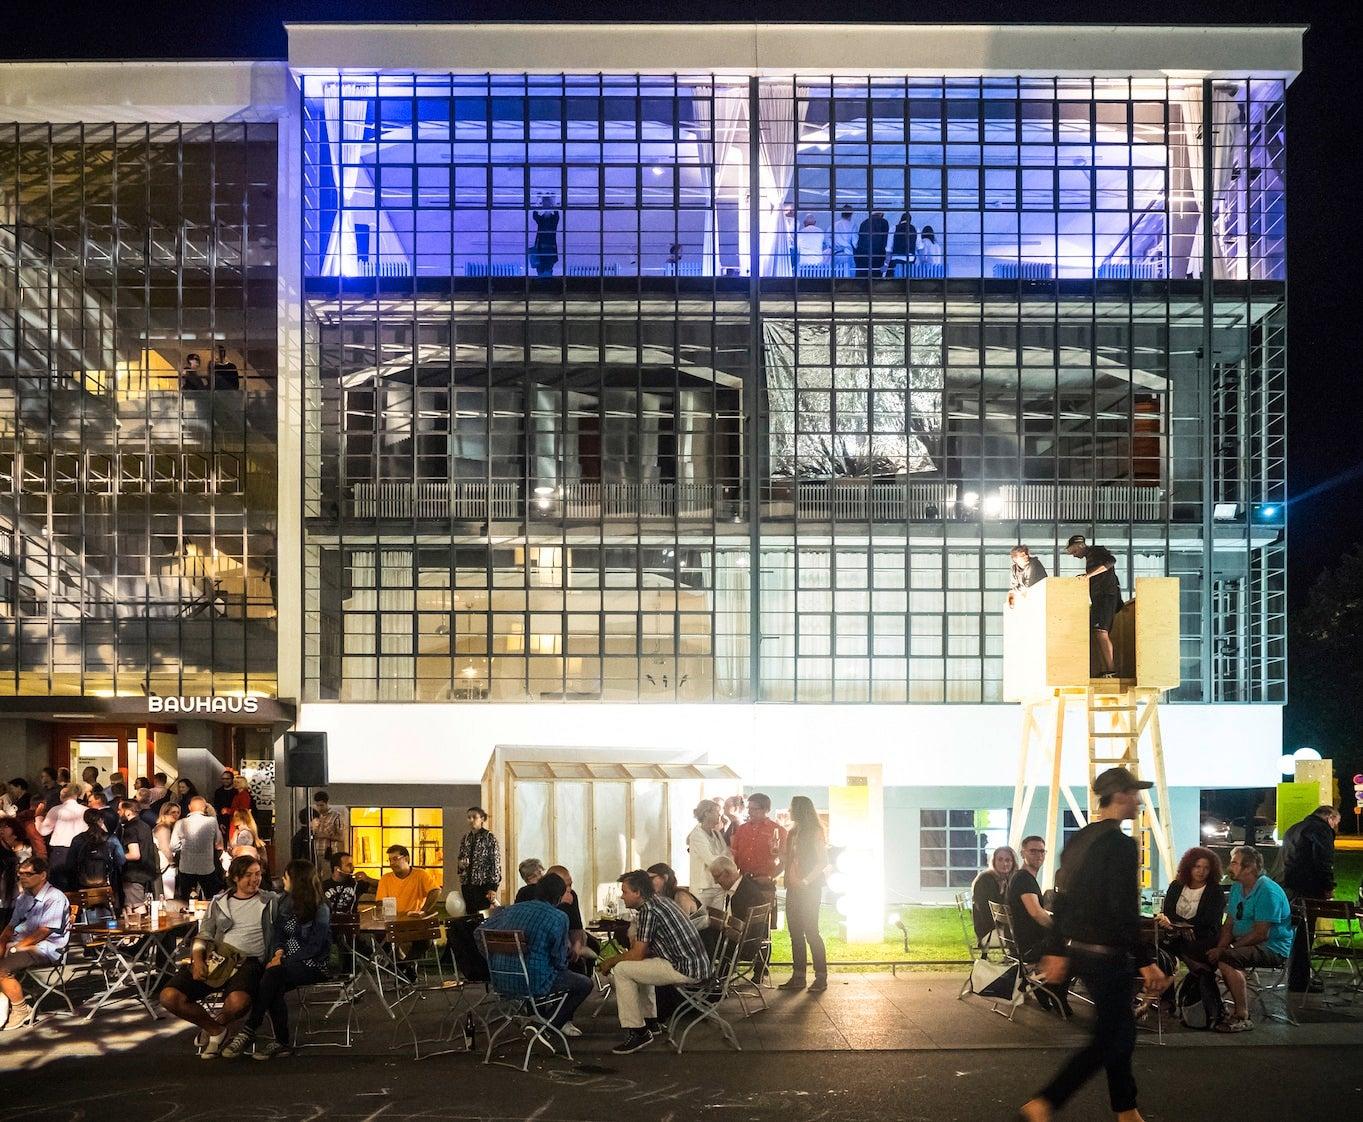 Bauhausfest 2016